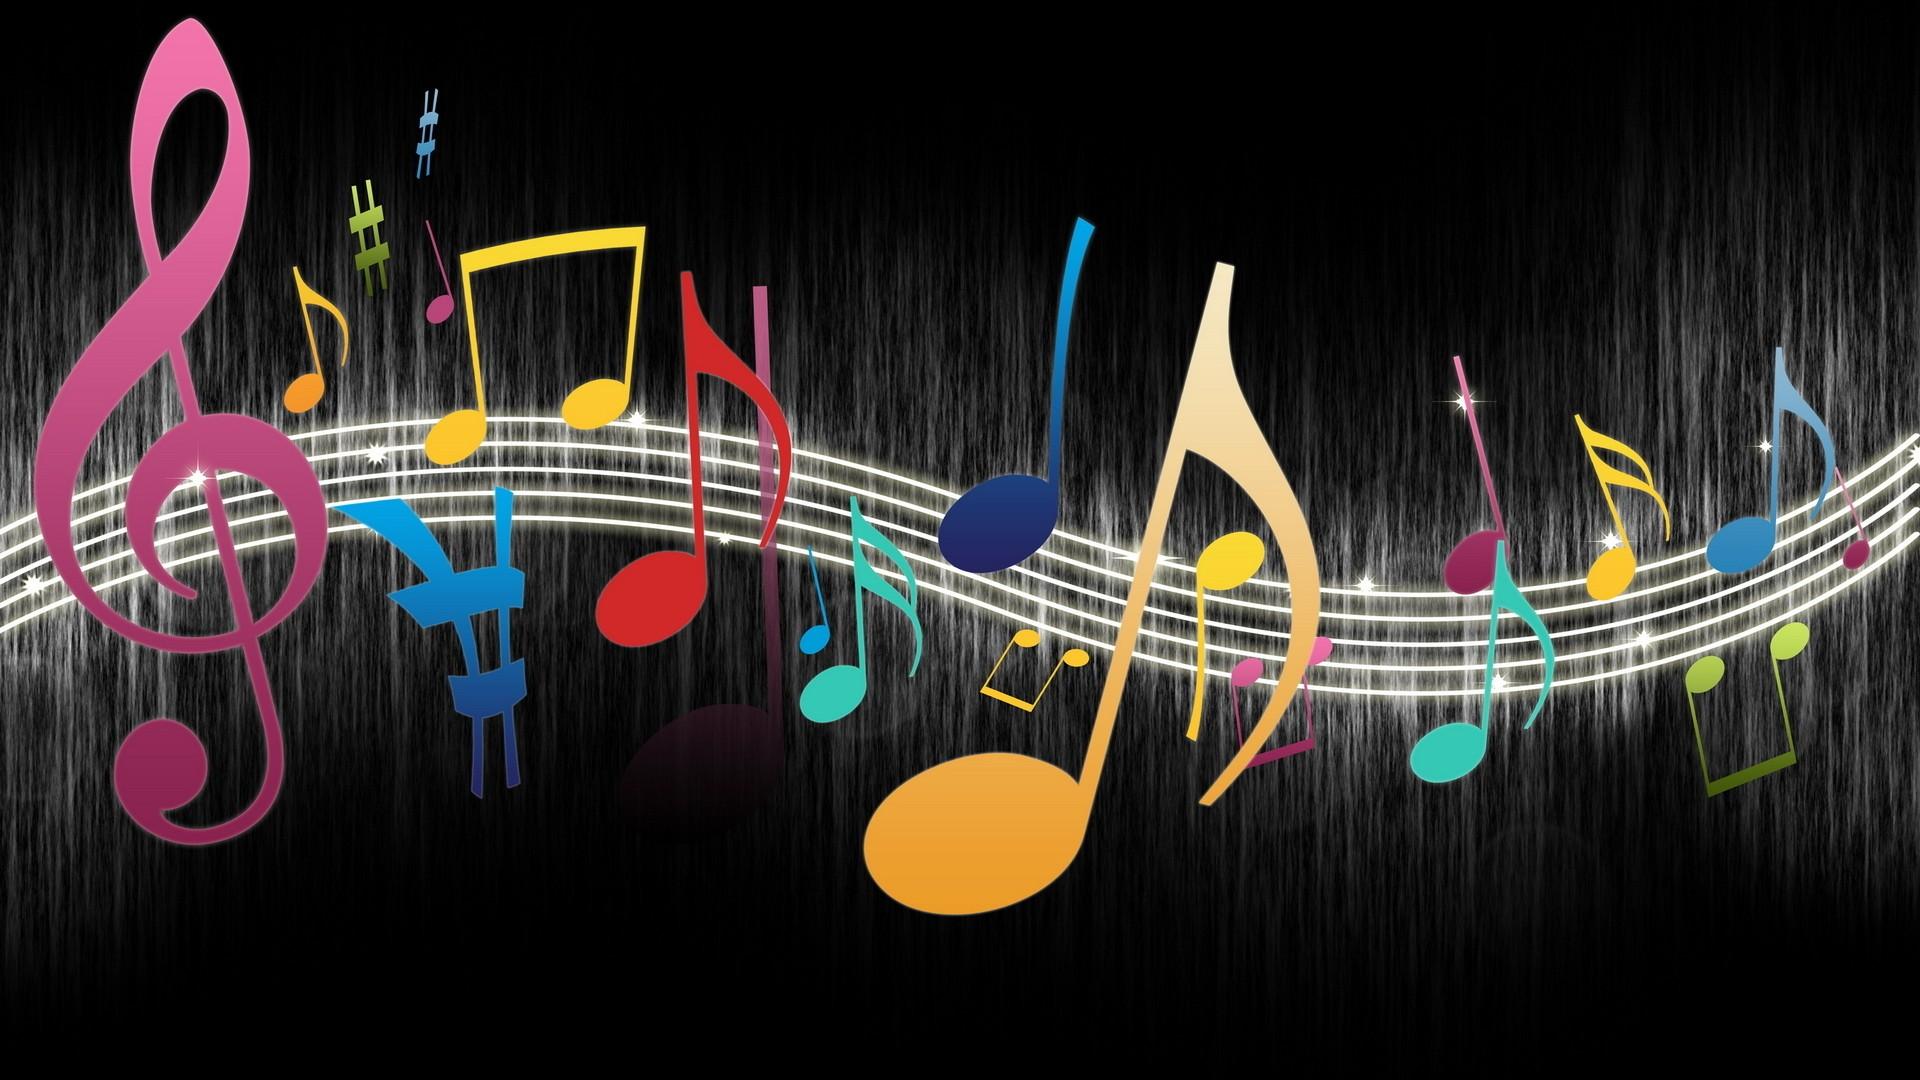 Music Wallpaper Hd Download Free Stunning Wallpapers For Desktop